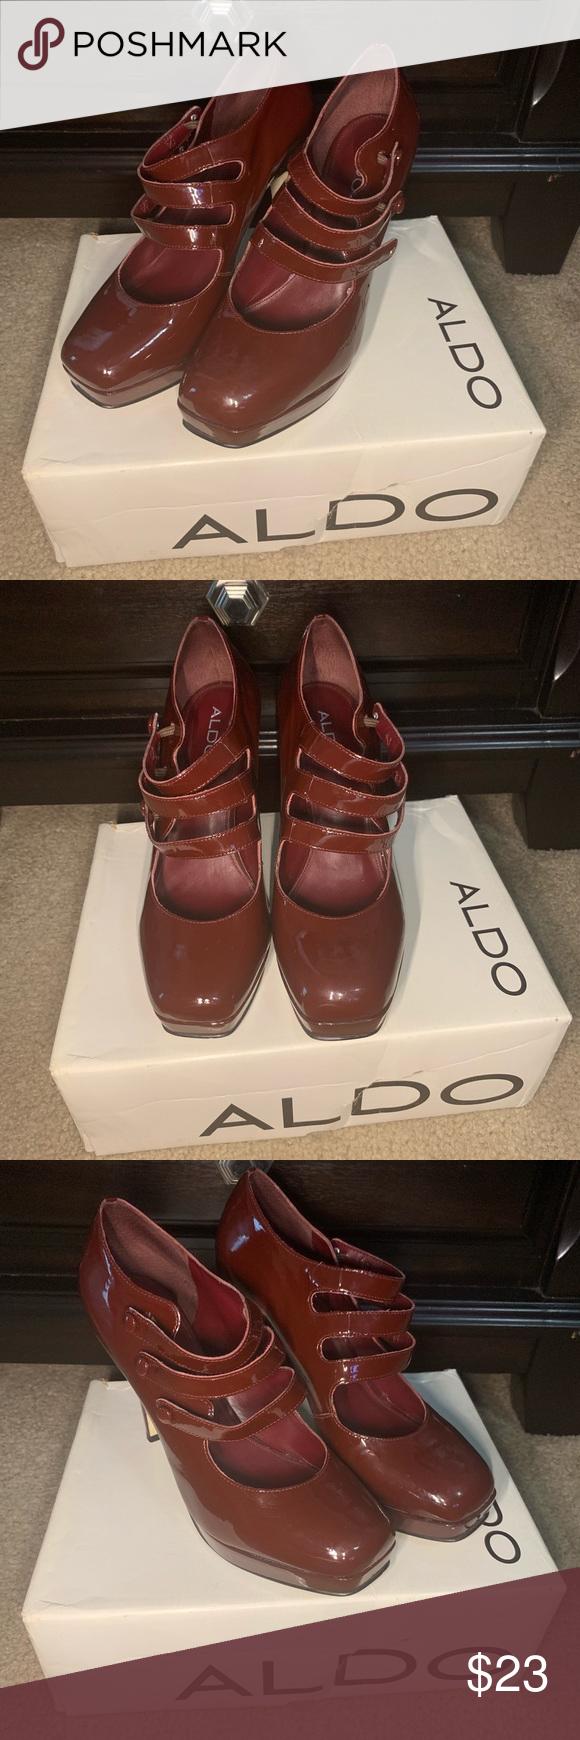 Burgundy platform Aldo heels size 10. Aldo heels, Dress